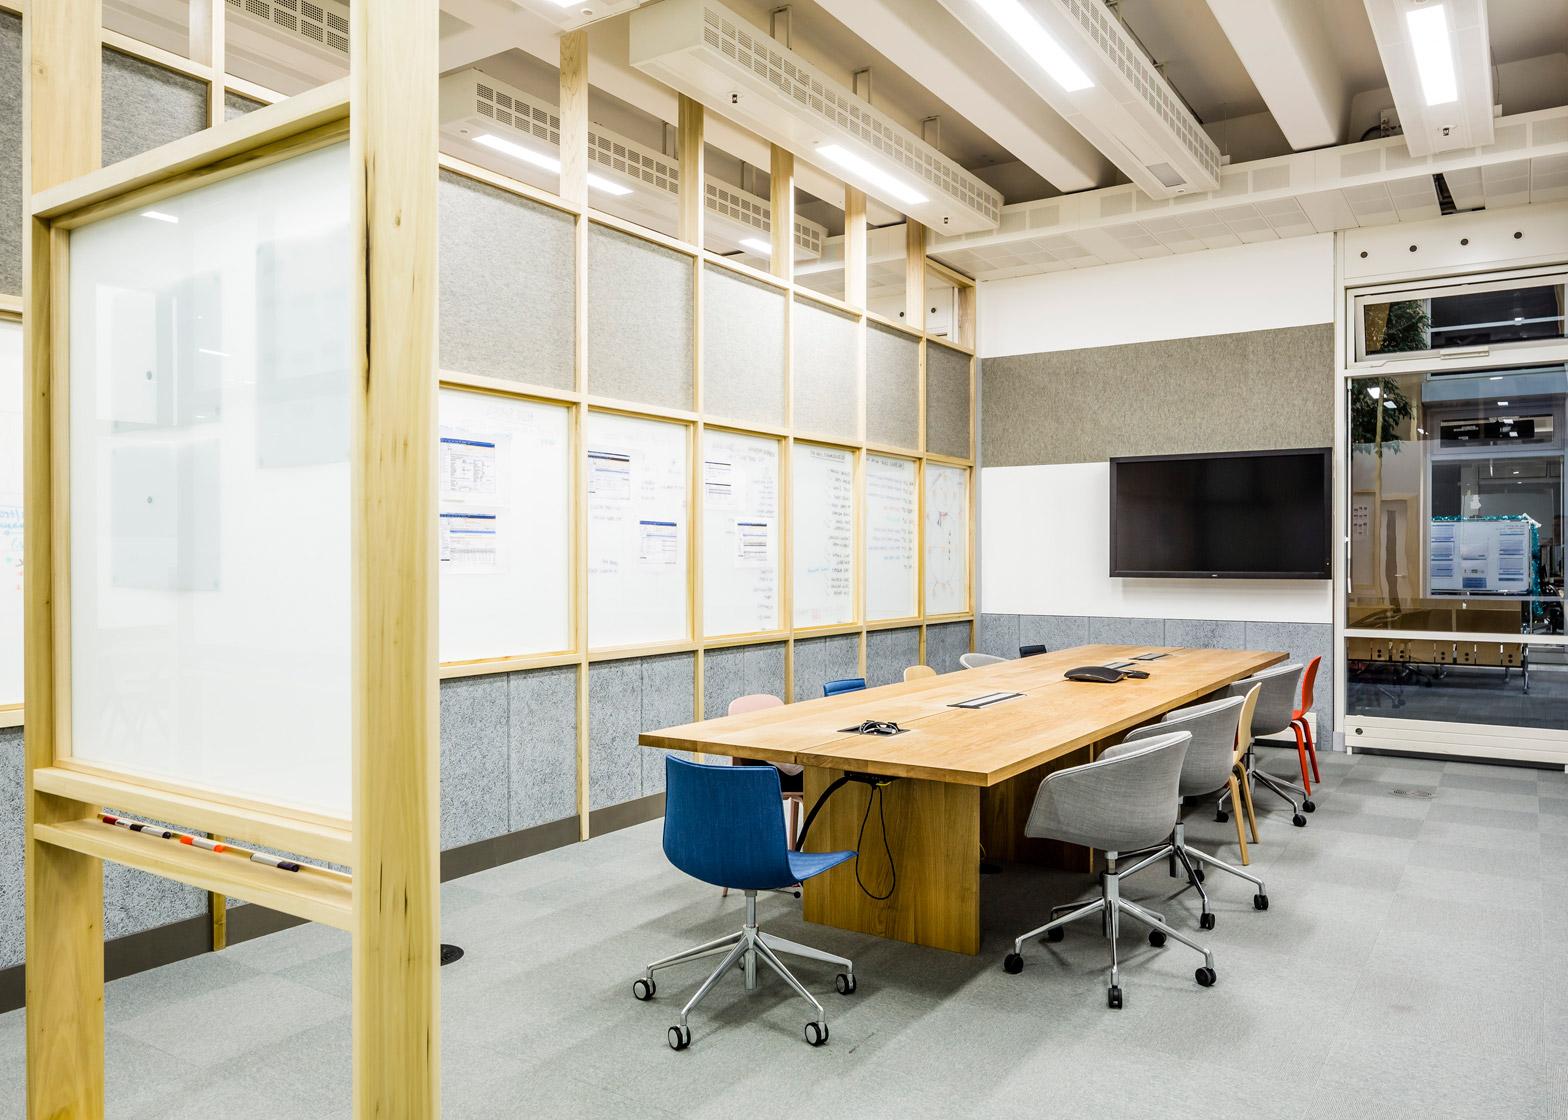 barclaycard-agile-workplace-APA-london-interior-design-_dezeen_1568_14